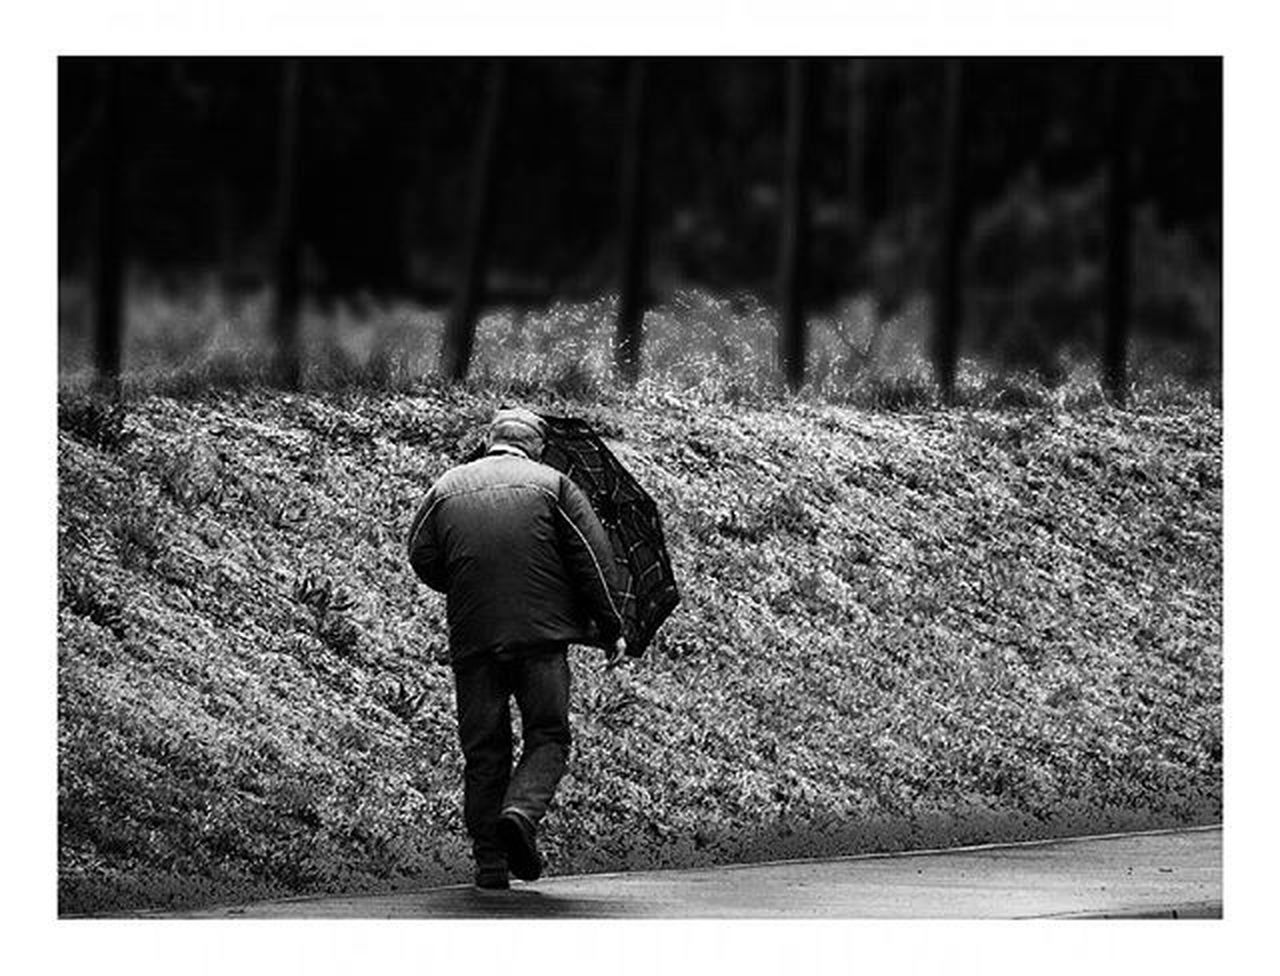 No subtitles. Blackandwhite Age OldButGold Oldman Umbrella Rain Art Instaart Instaartist Insatgood Instalike Ig_algarve_ Amaralgarve Algarvealive Motion Story Photography Photooftheday Picoftheday Polaroid Portugal_em_fotos Super_algarve